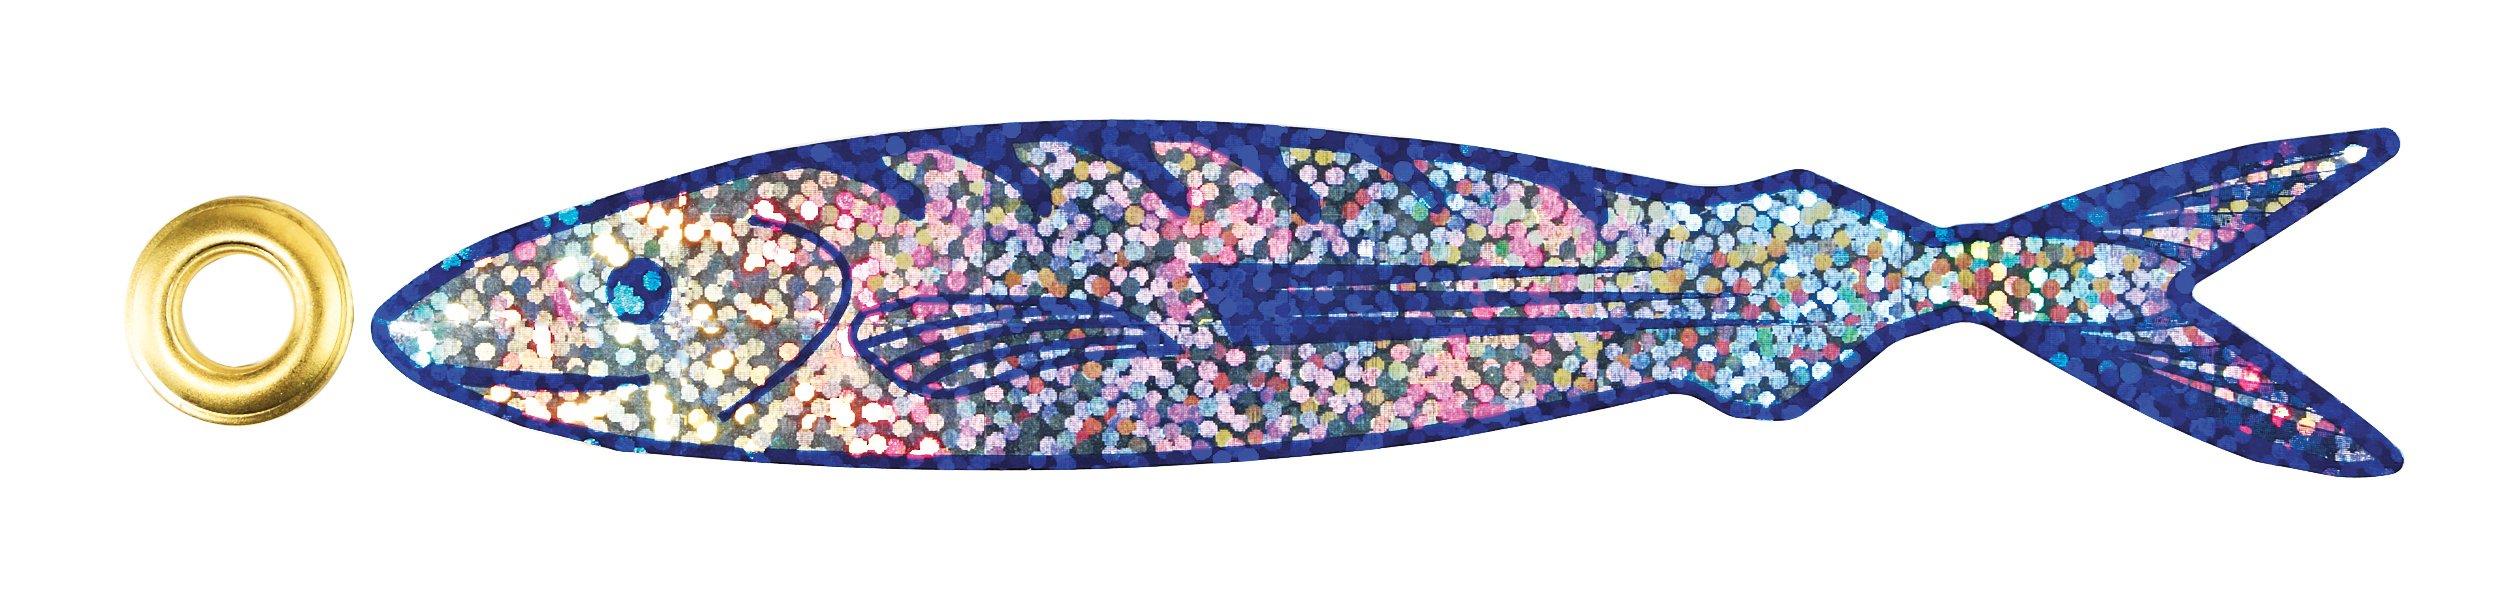 Strike Point Tackle 36'' Dredge & Teaser Kit Sardine Fish Strips by Strike Point Tackle